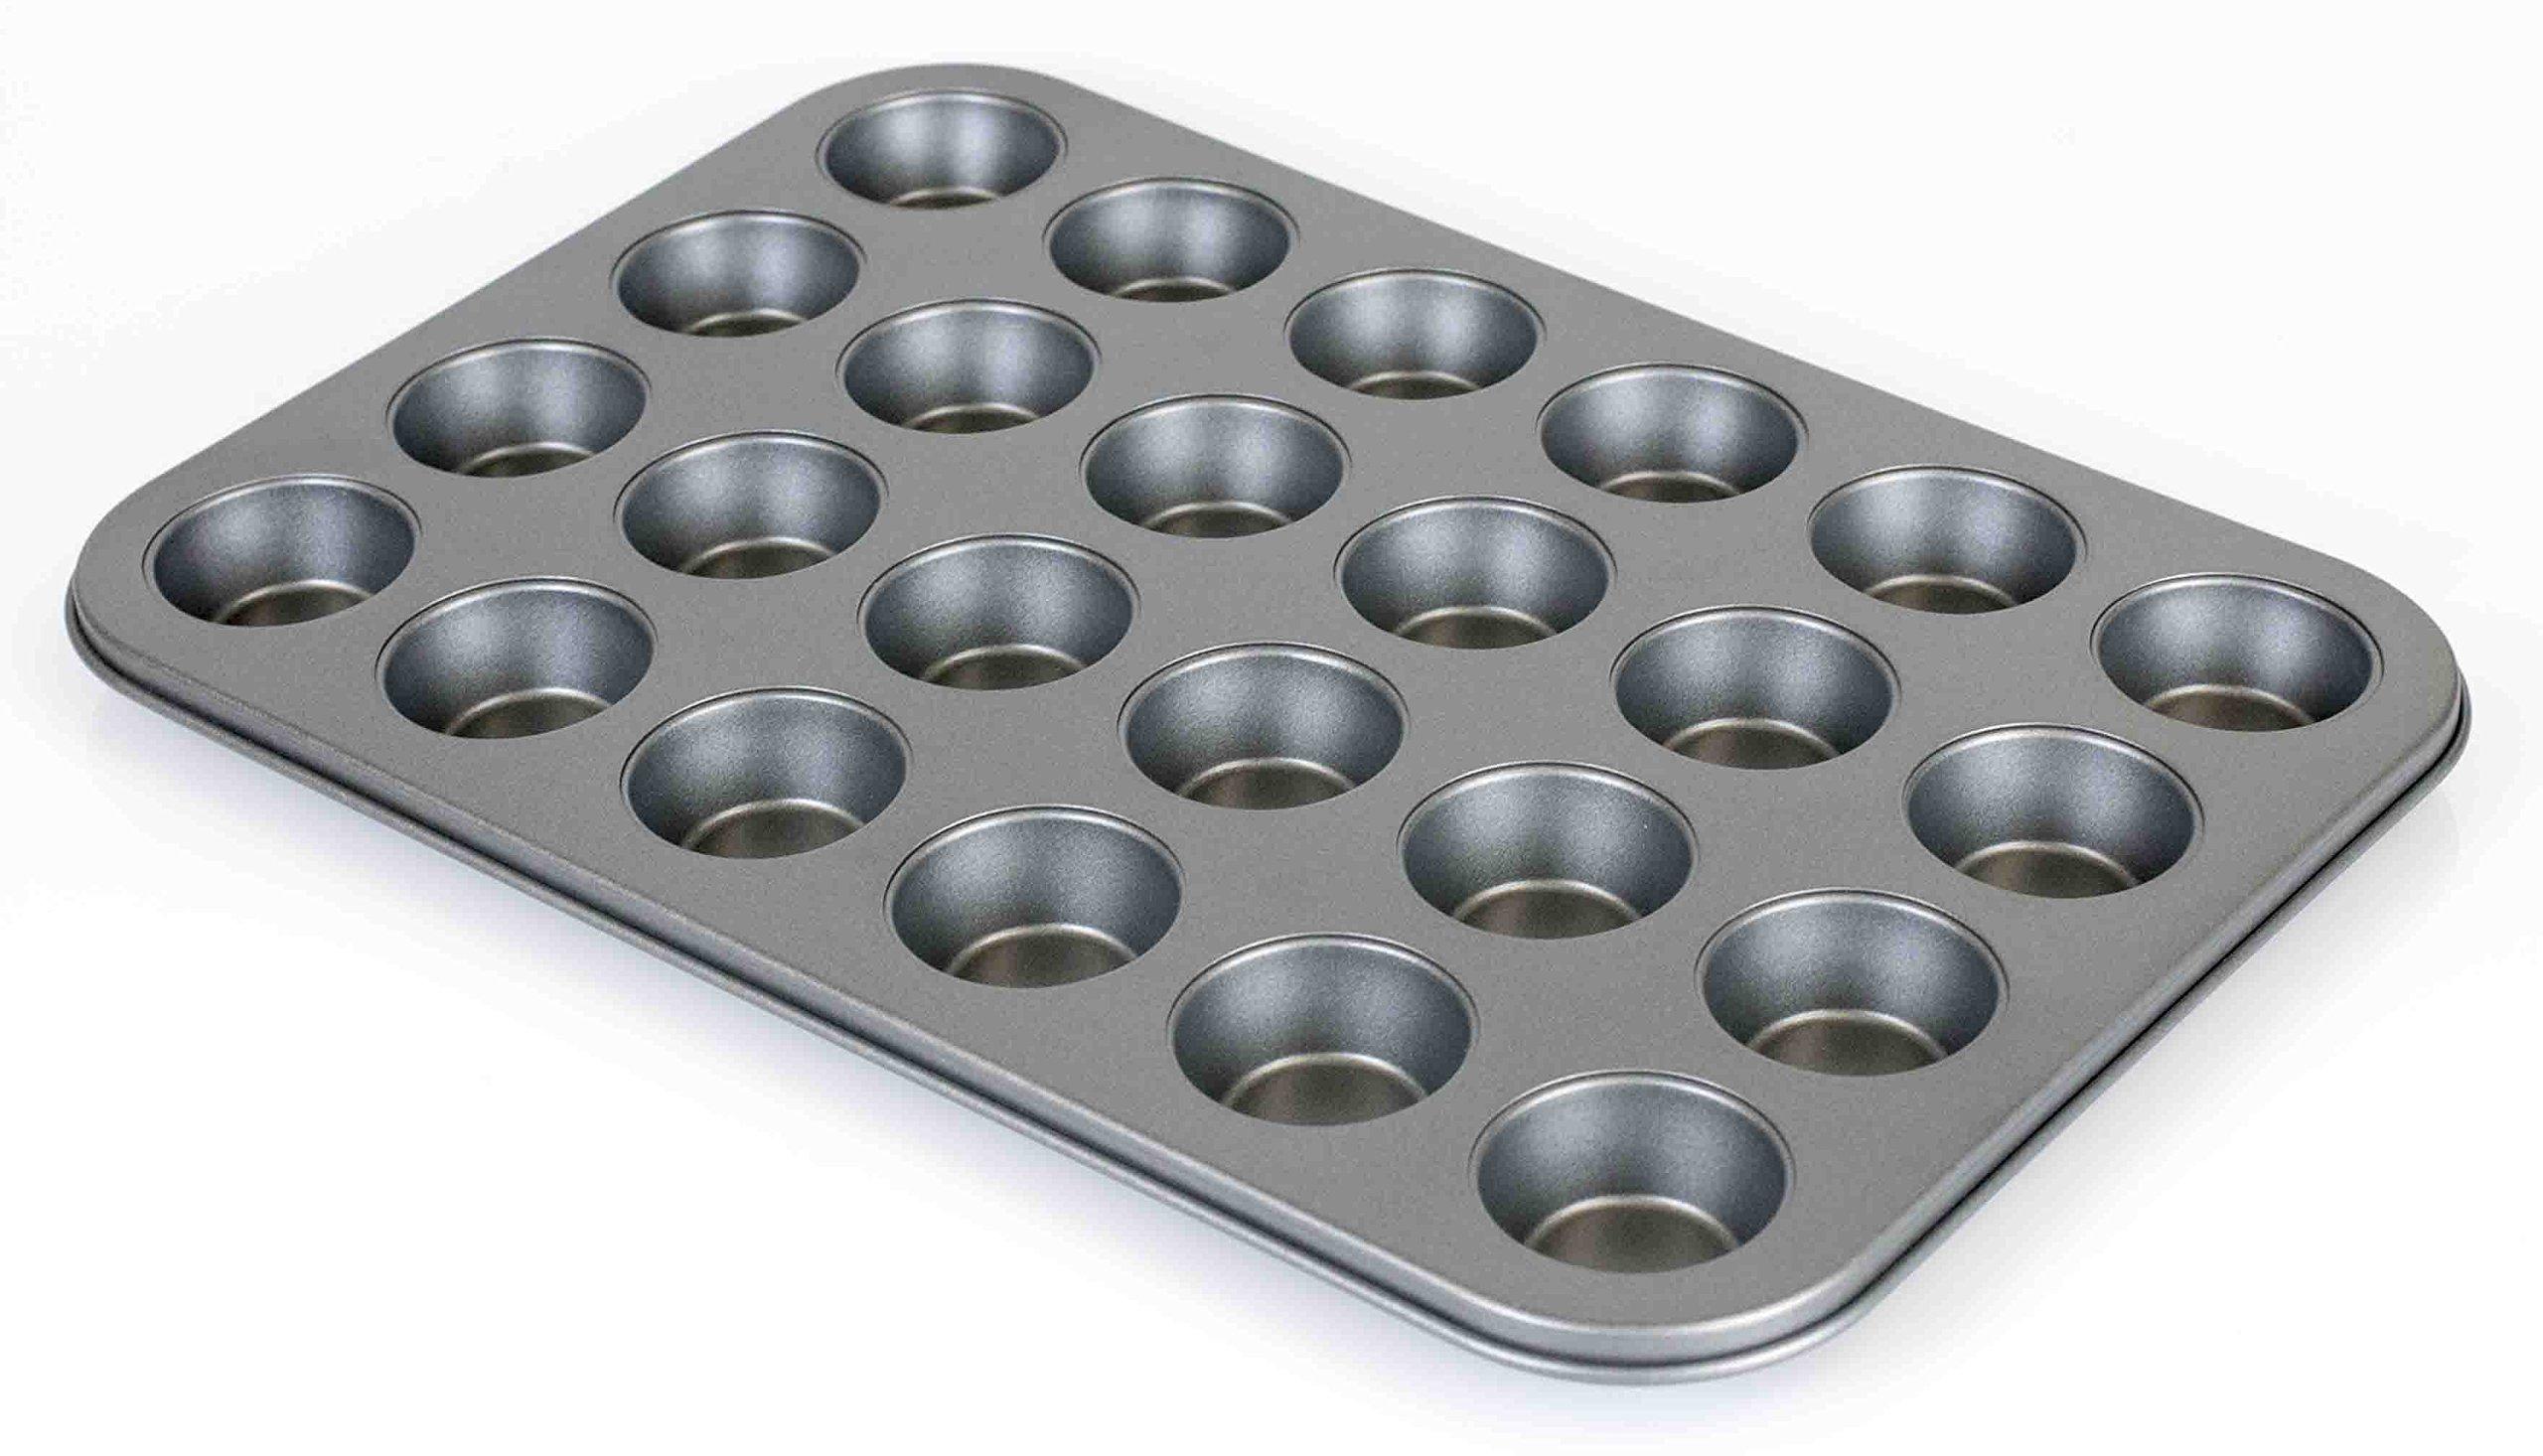 Home Basics 24 Cup Non-Stick Steel Mini Cup Cake Pan, Grey